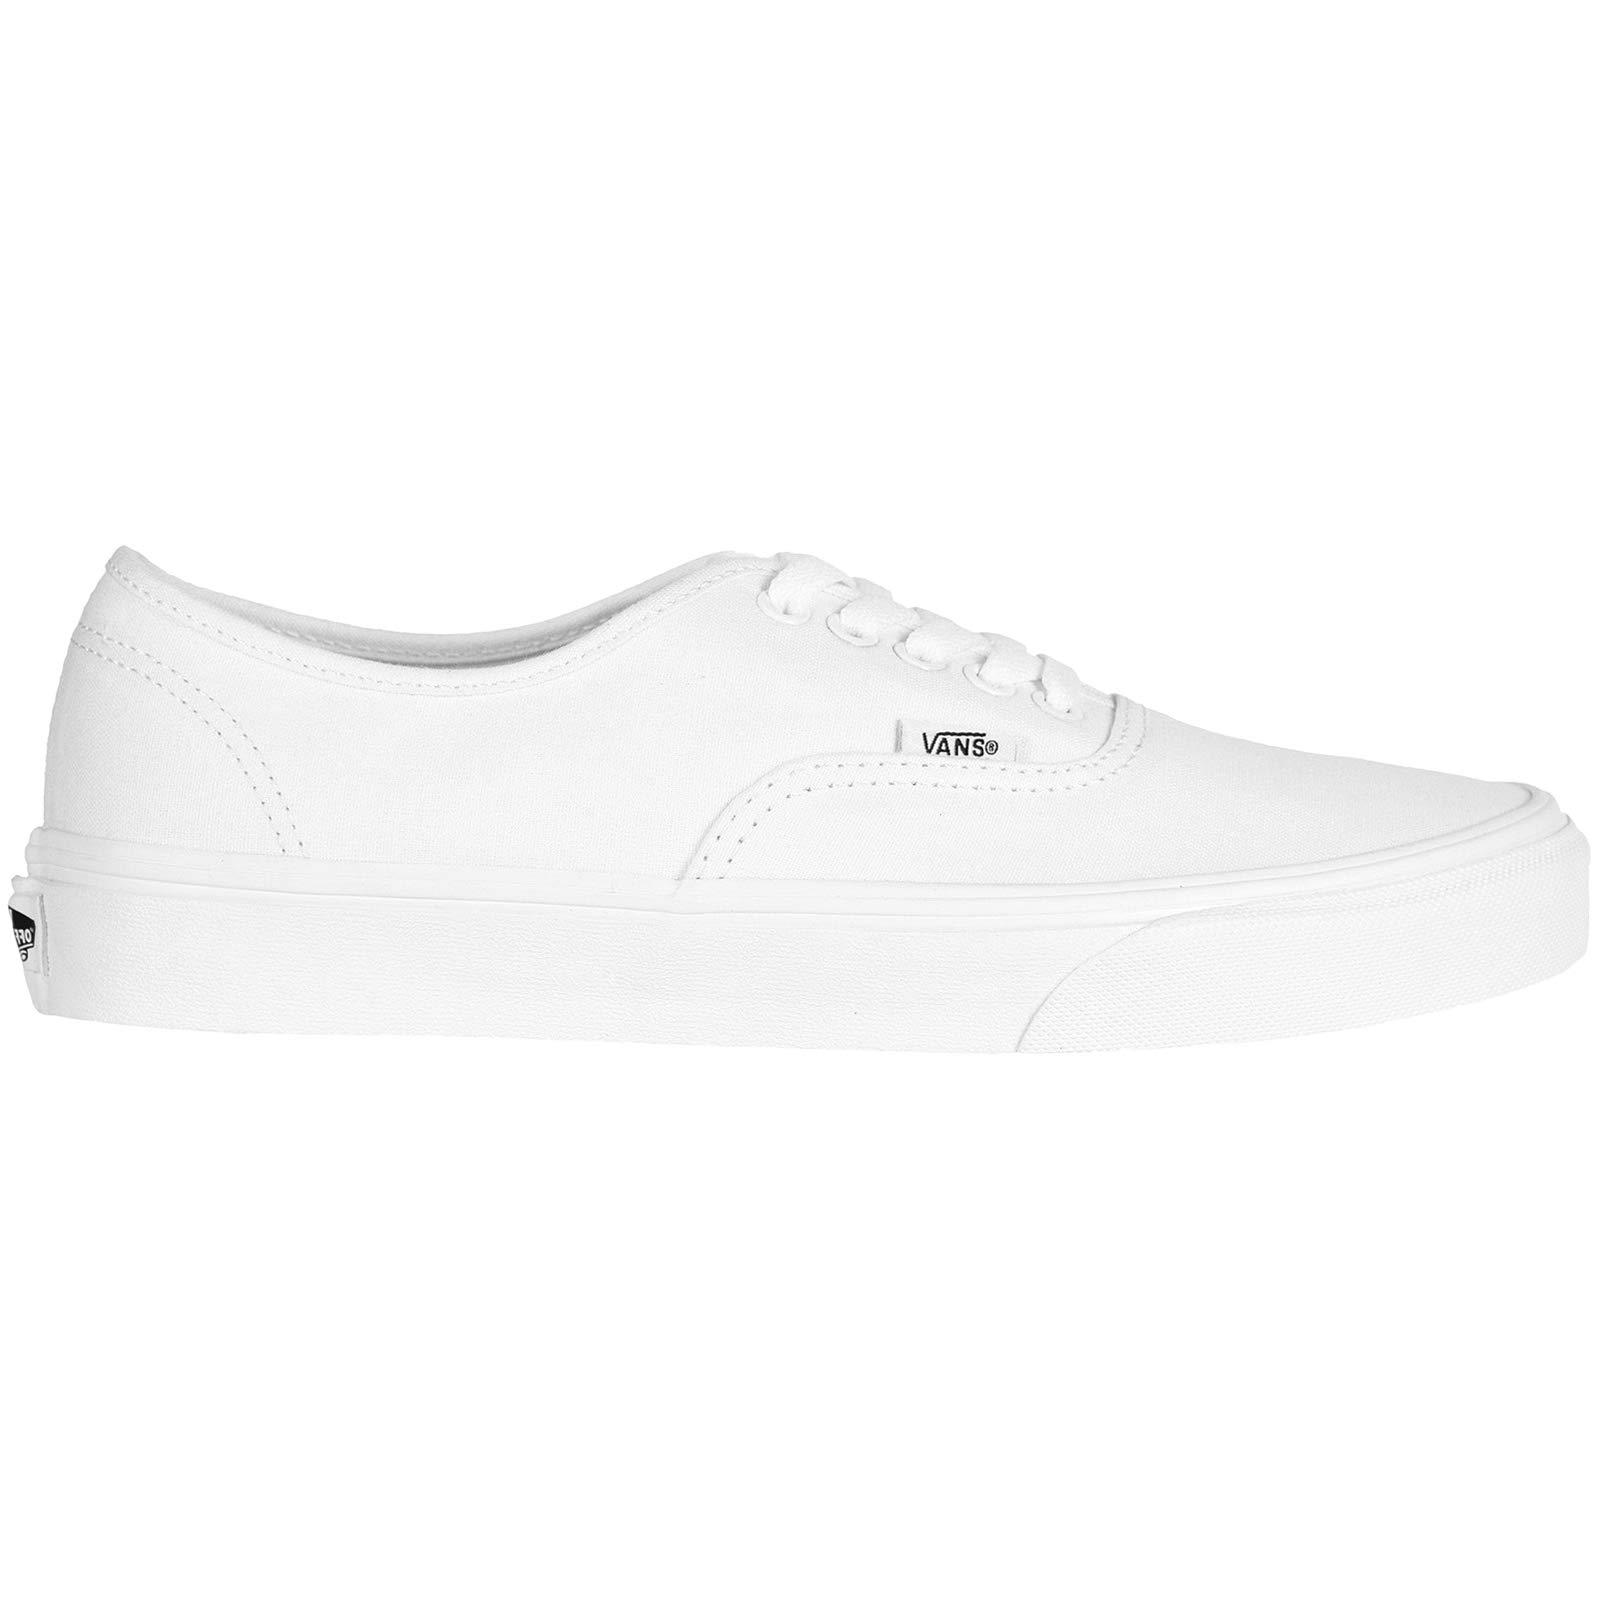 b5498e920a Vans Authentic Original Sneakers - true white